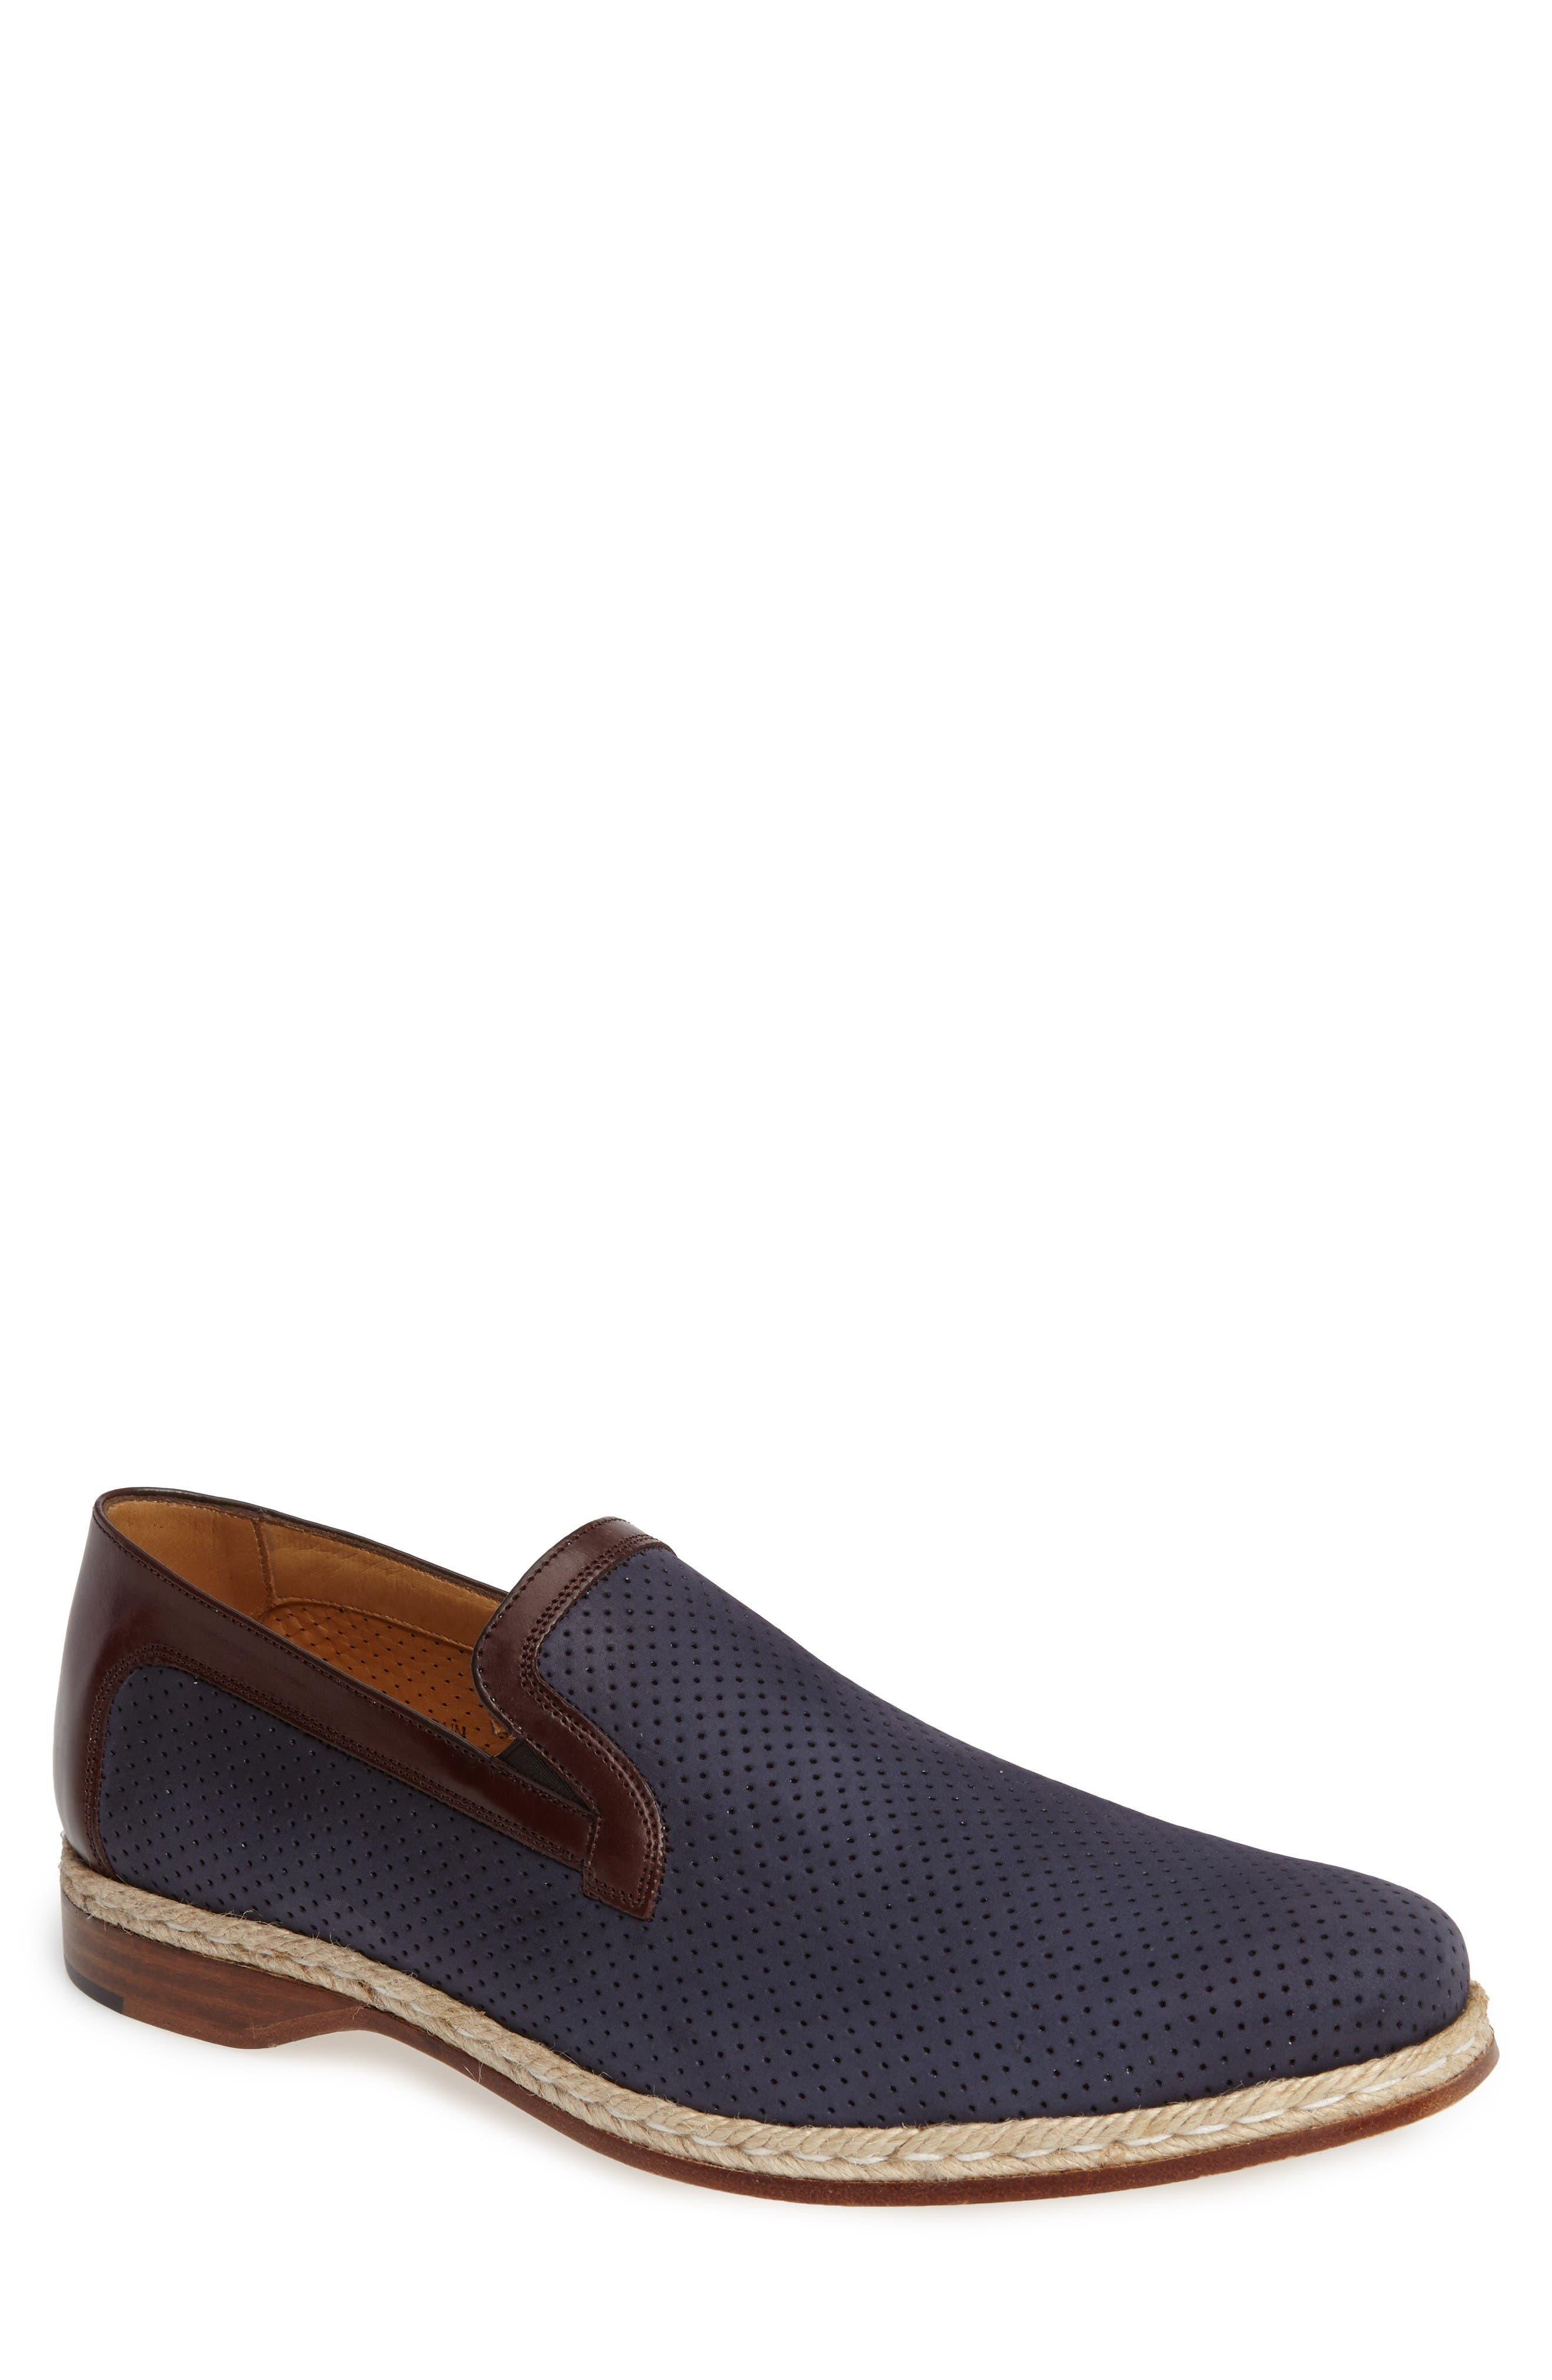 Mezlan Marcet Perforated Loafer (Men)